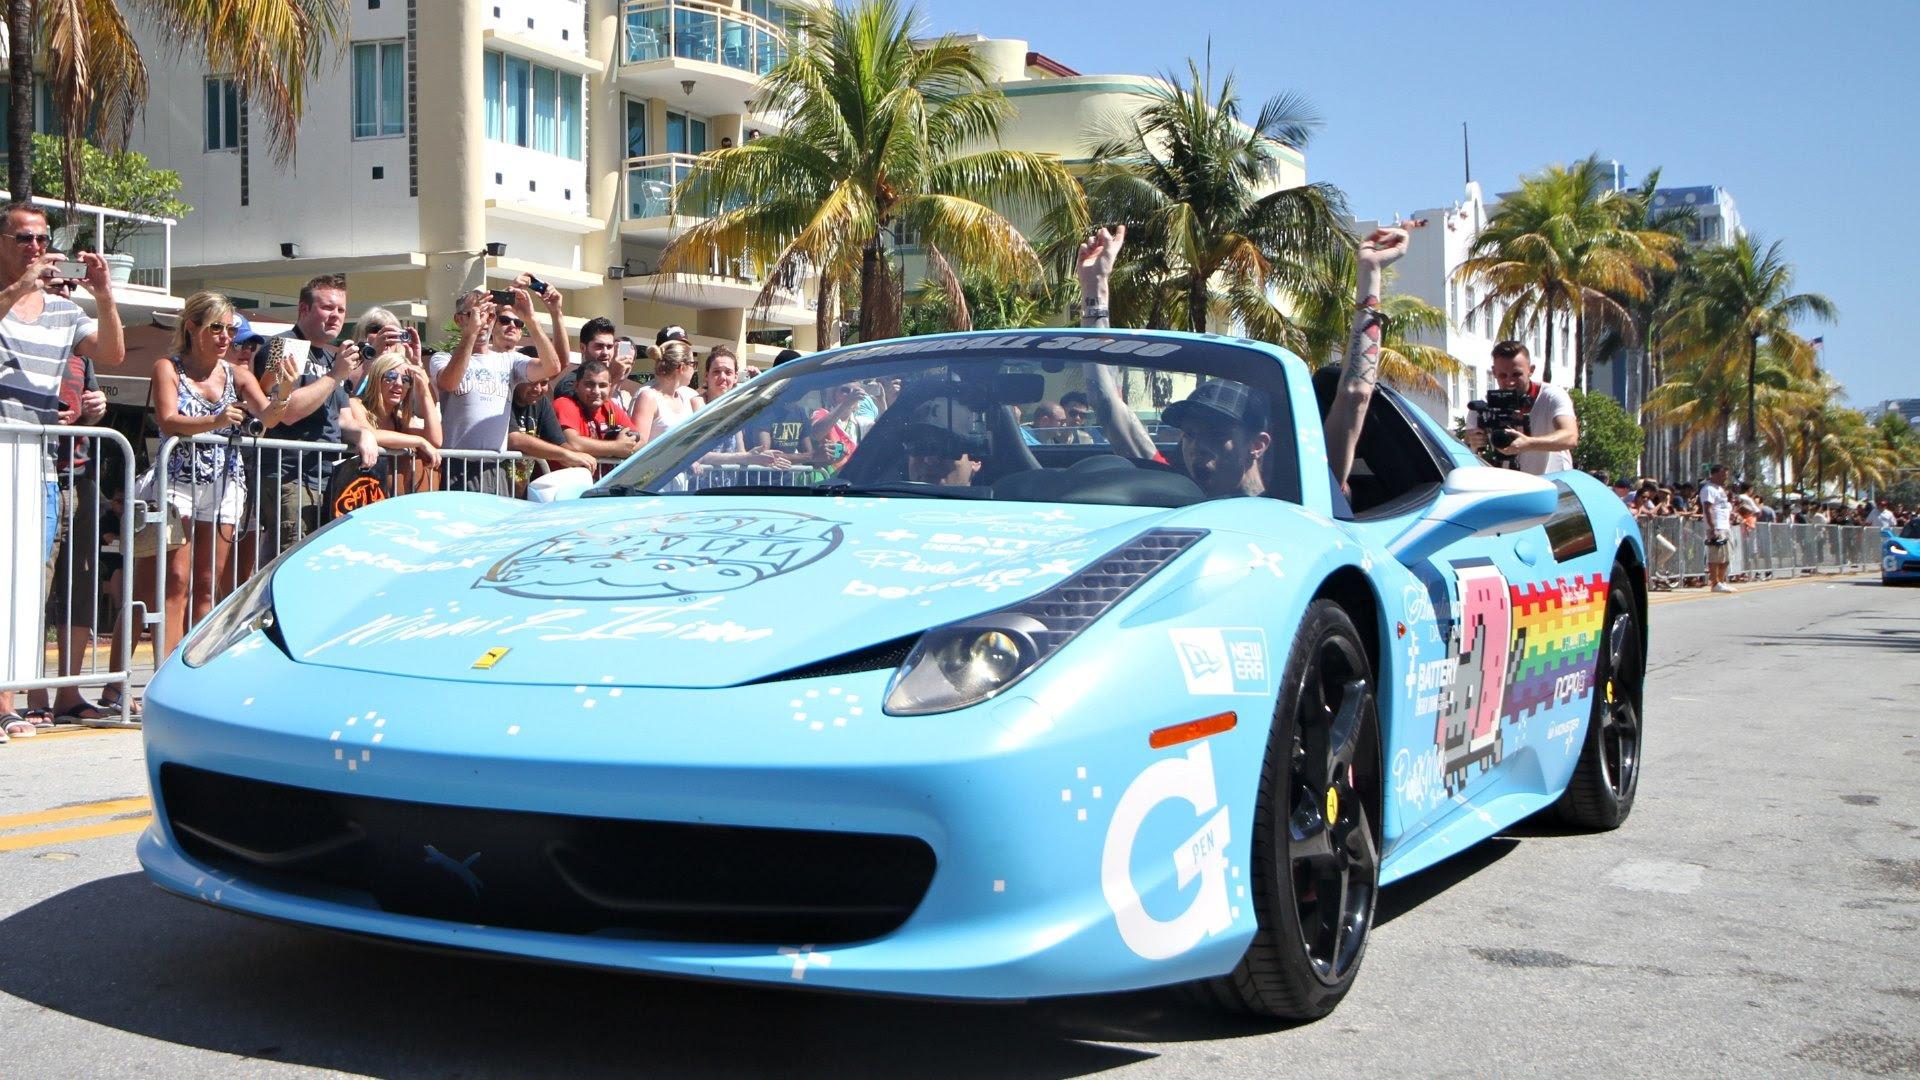 Ferrari Hates DeadMau5s Nyan Cat Car, Sends Cease And Desist